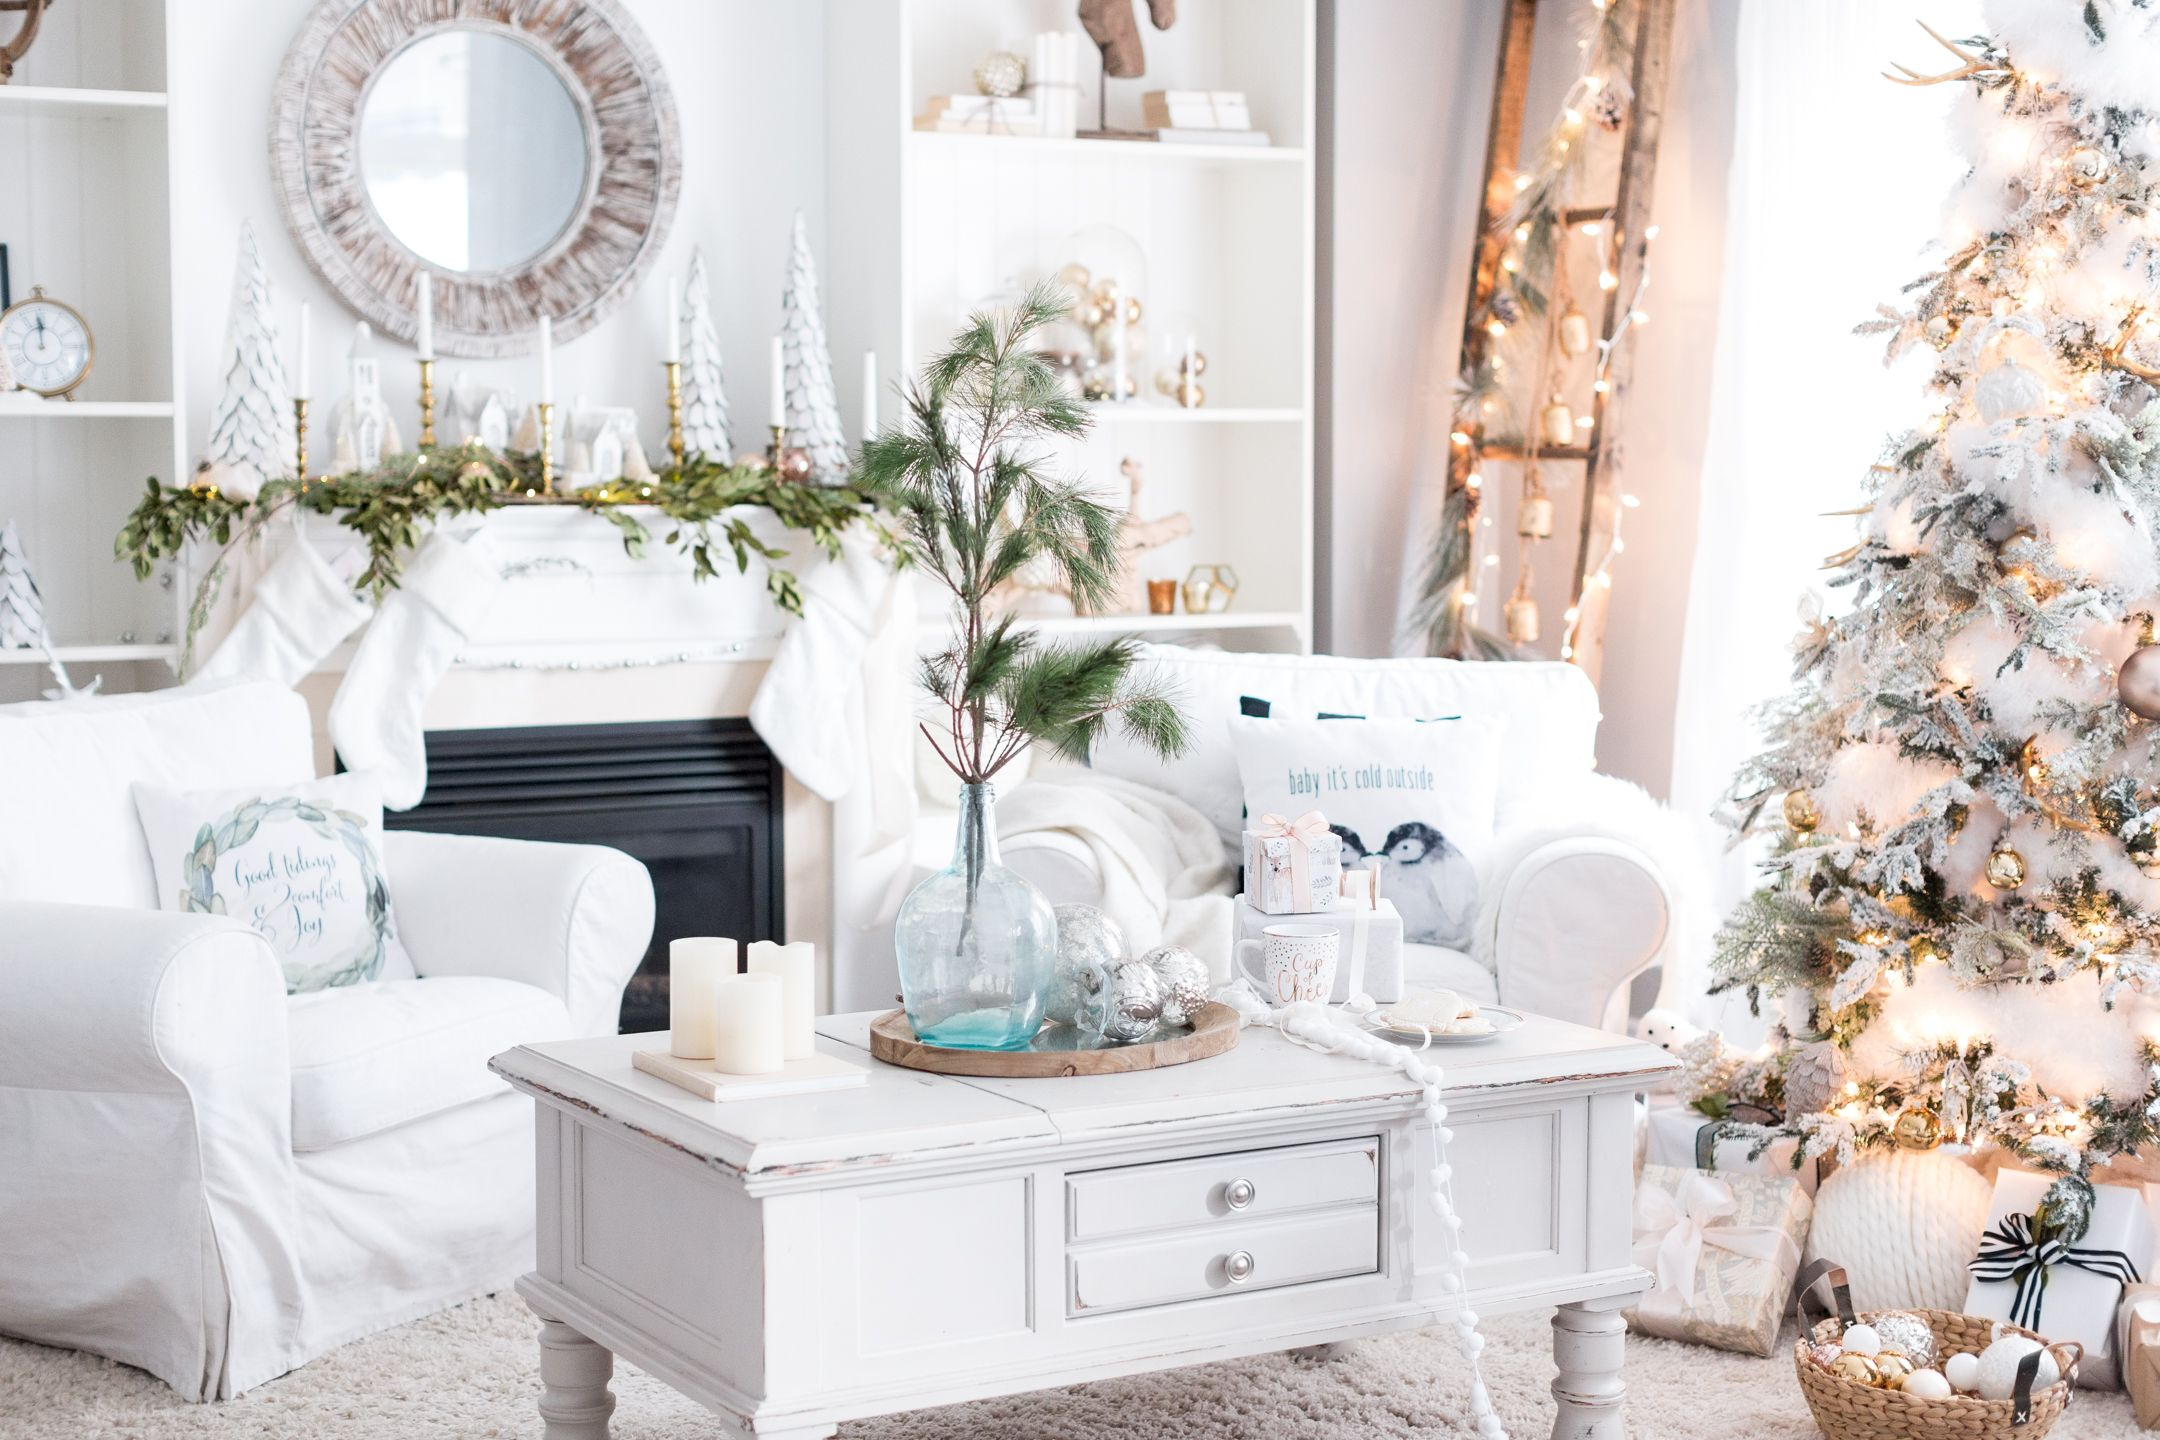 Decorating Small Christmas Tree Ideas & Interior Design U2013 How To ...